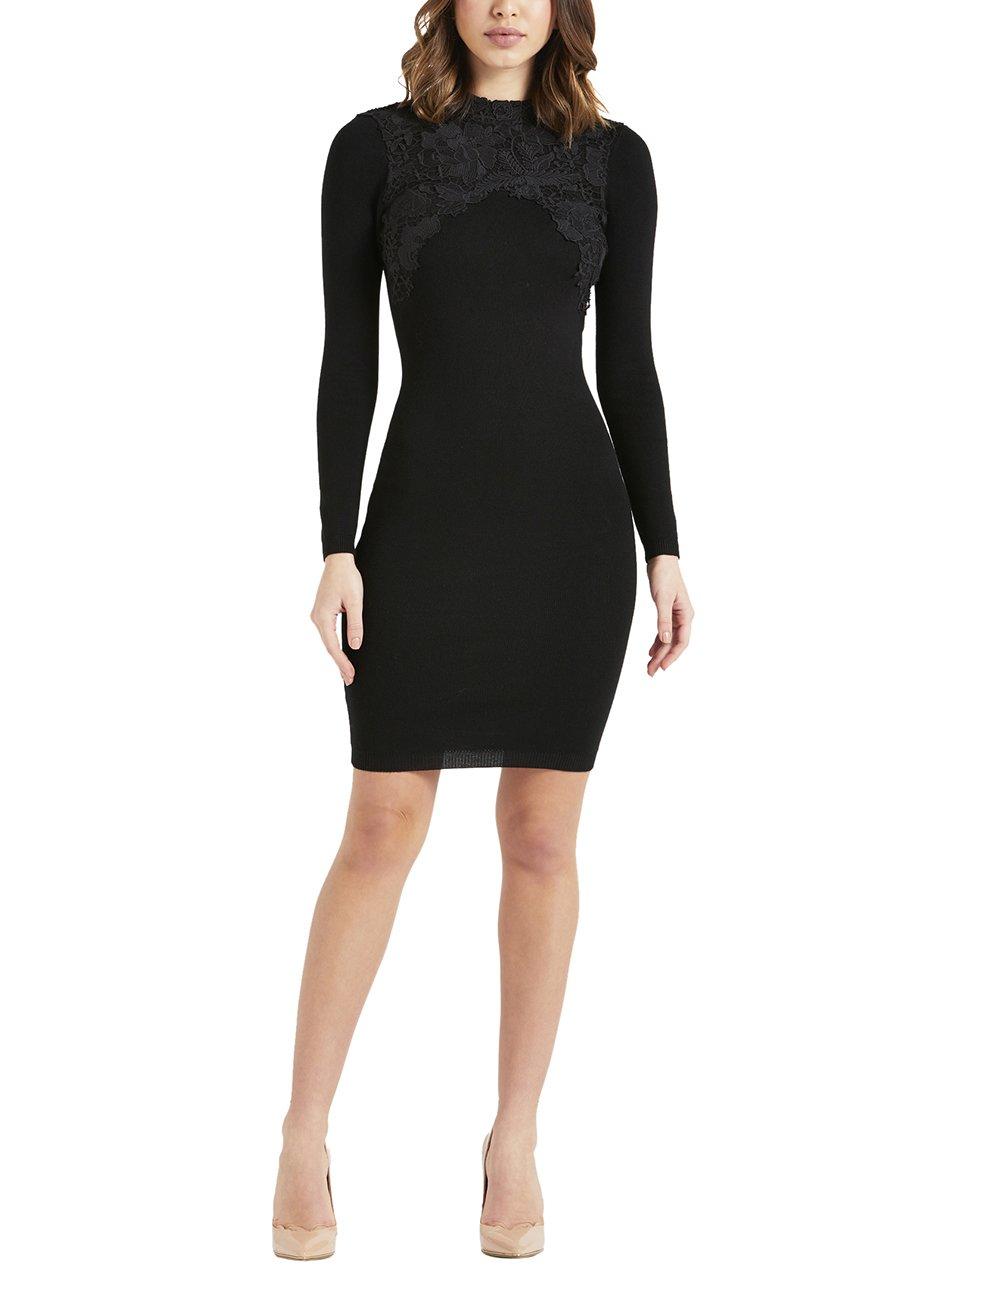 LIPSY Womens Lace Appliquà Dress Black US 10 (UK 14) by LIPSY (Image #1)